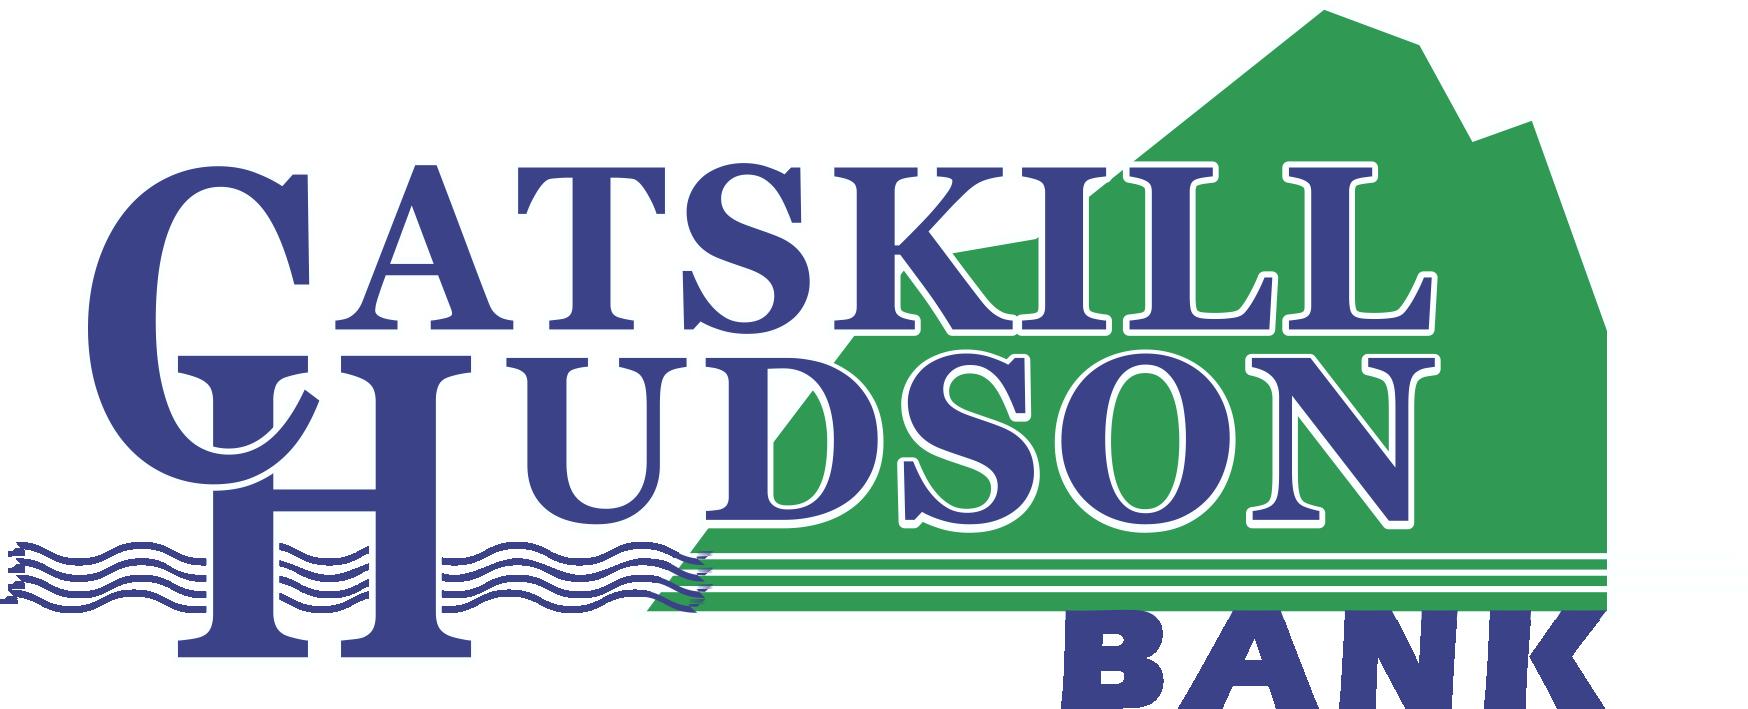 Catskill Hudson Bank